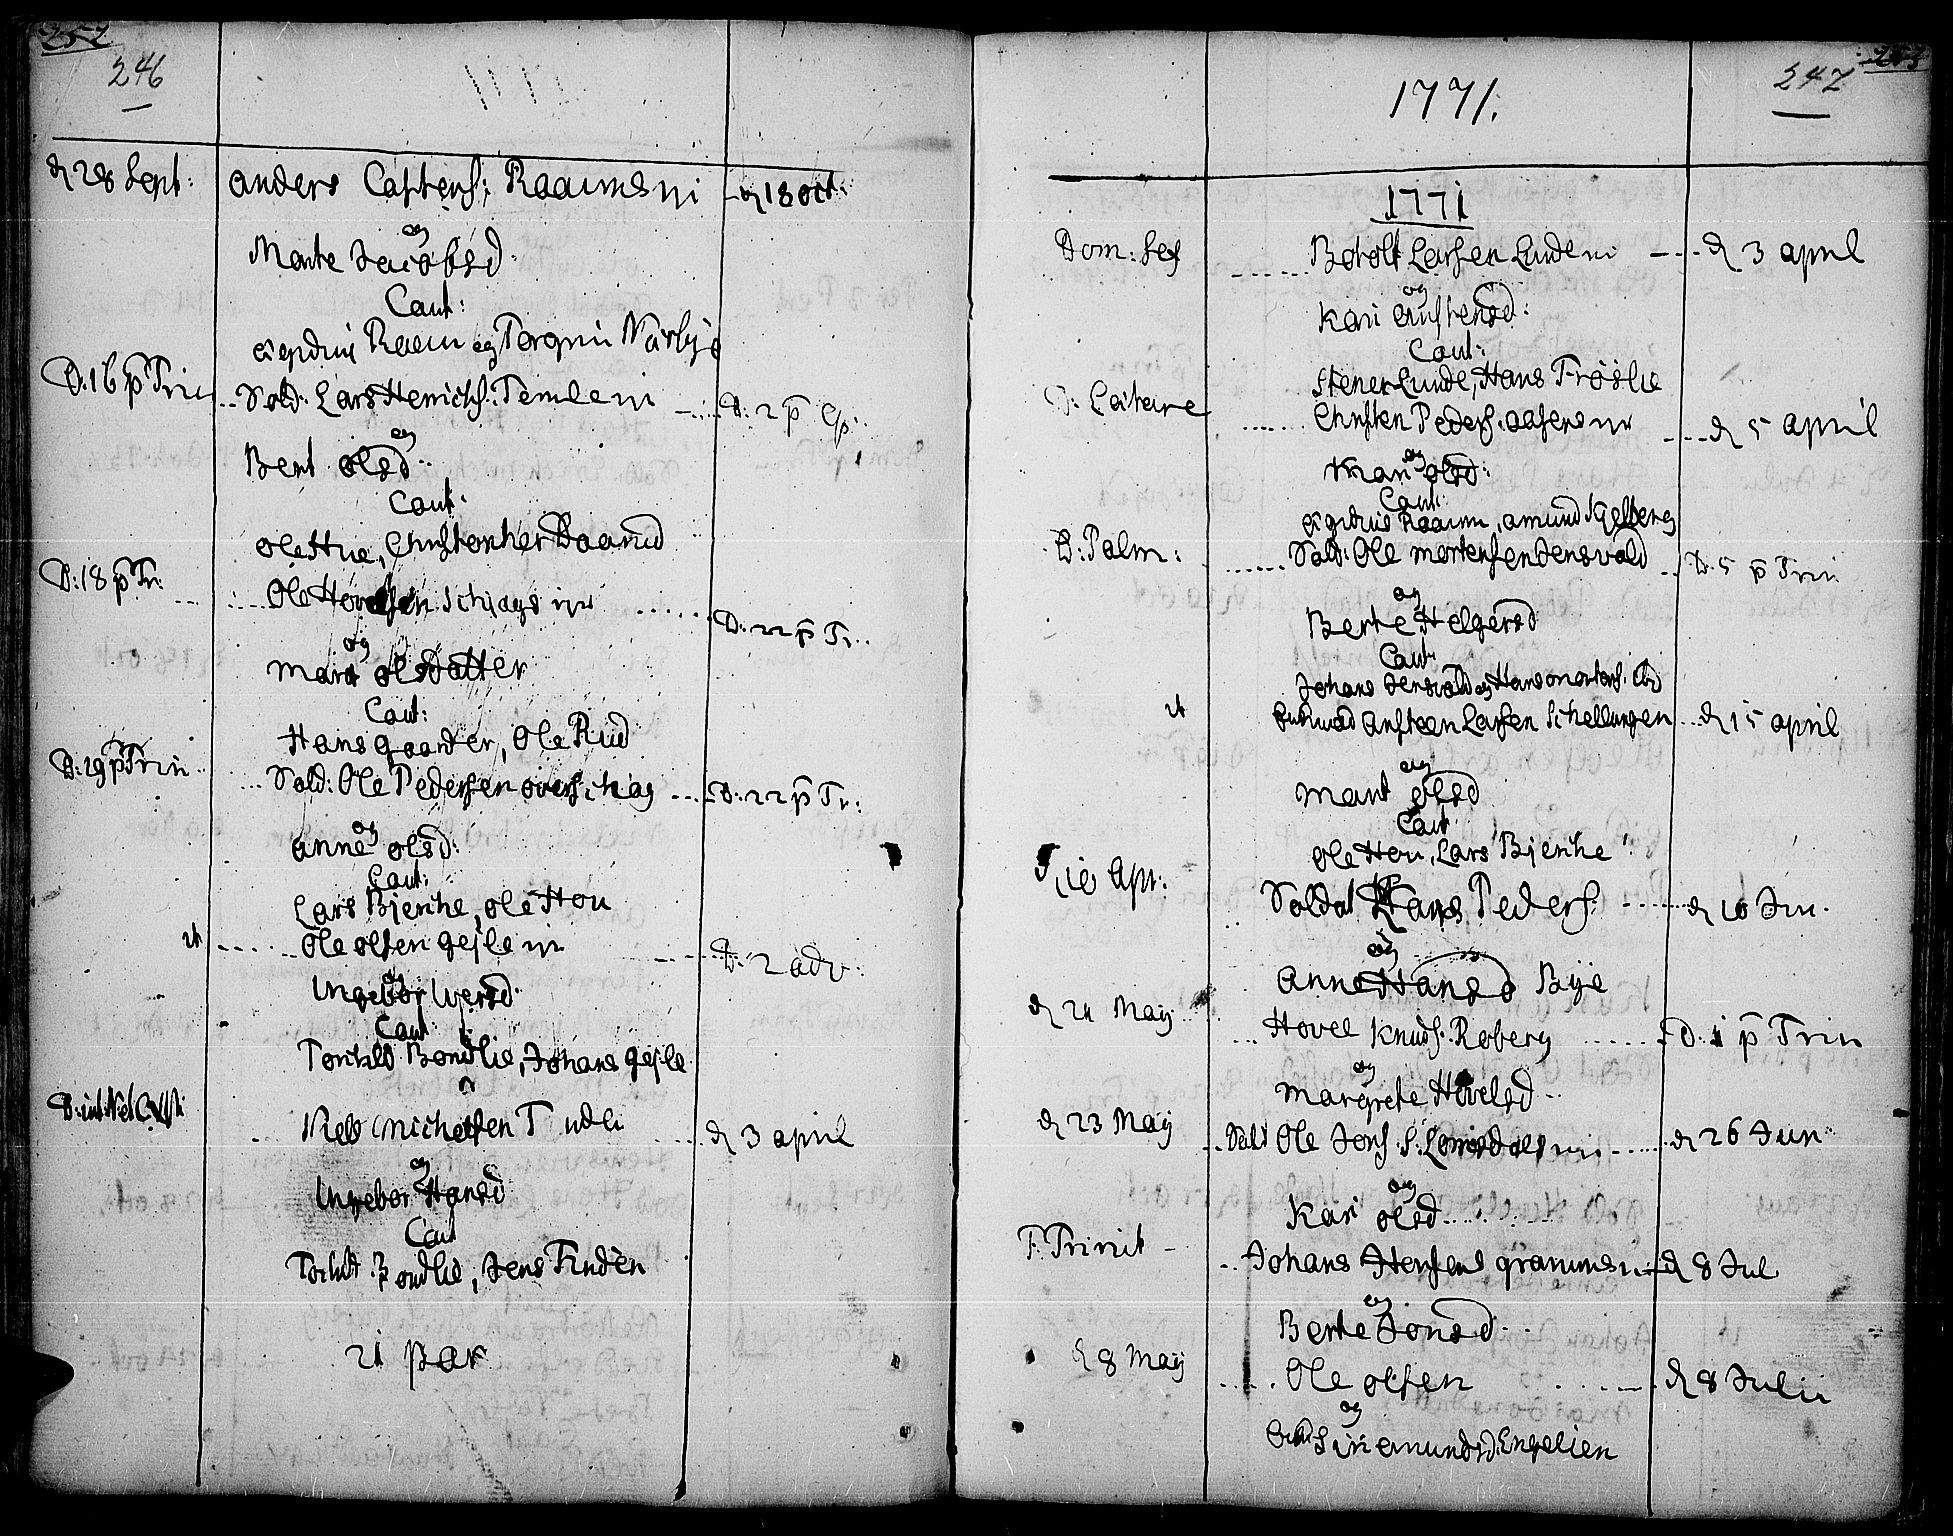 SAH, Land prestekontor, Ministerialbok nr. 5, 1765-1784, s. 246-247